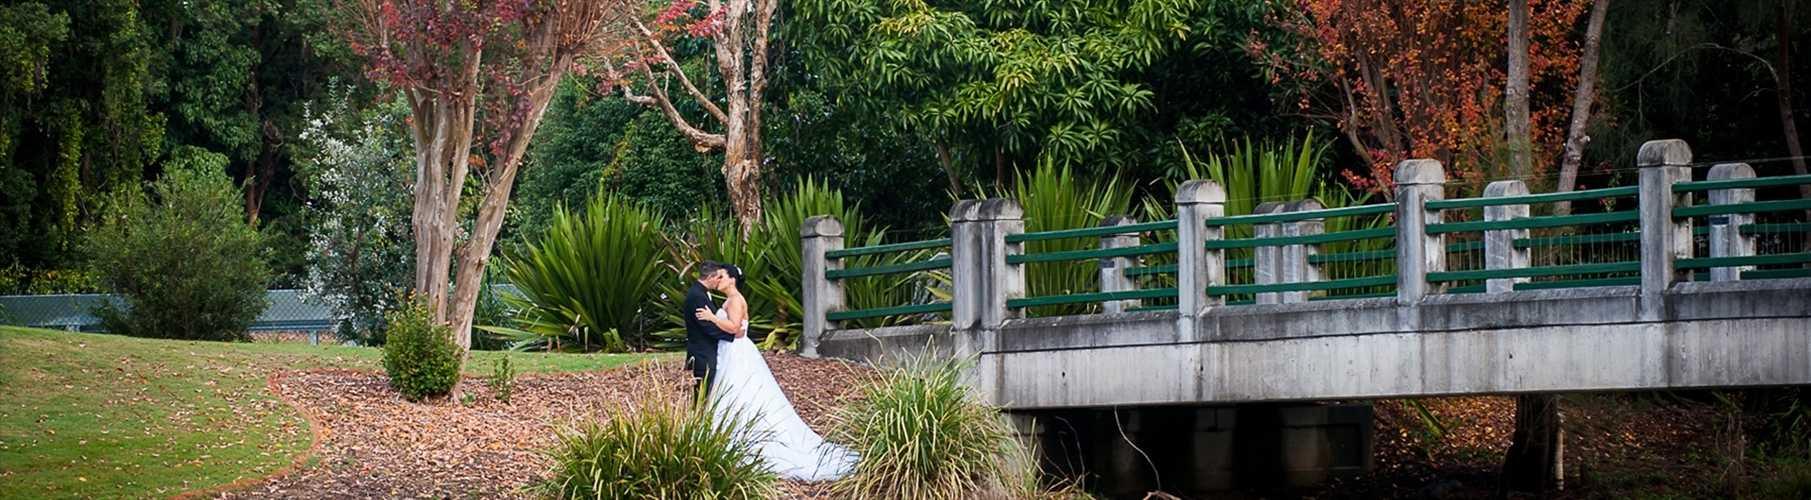 Wedding Venue - Lakelands Golf Club 22 on Veilability